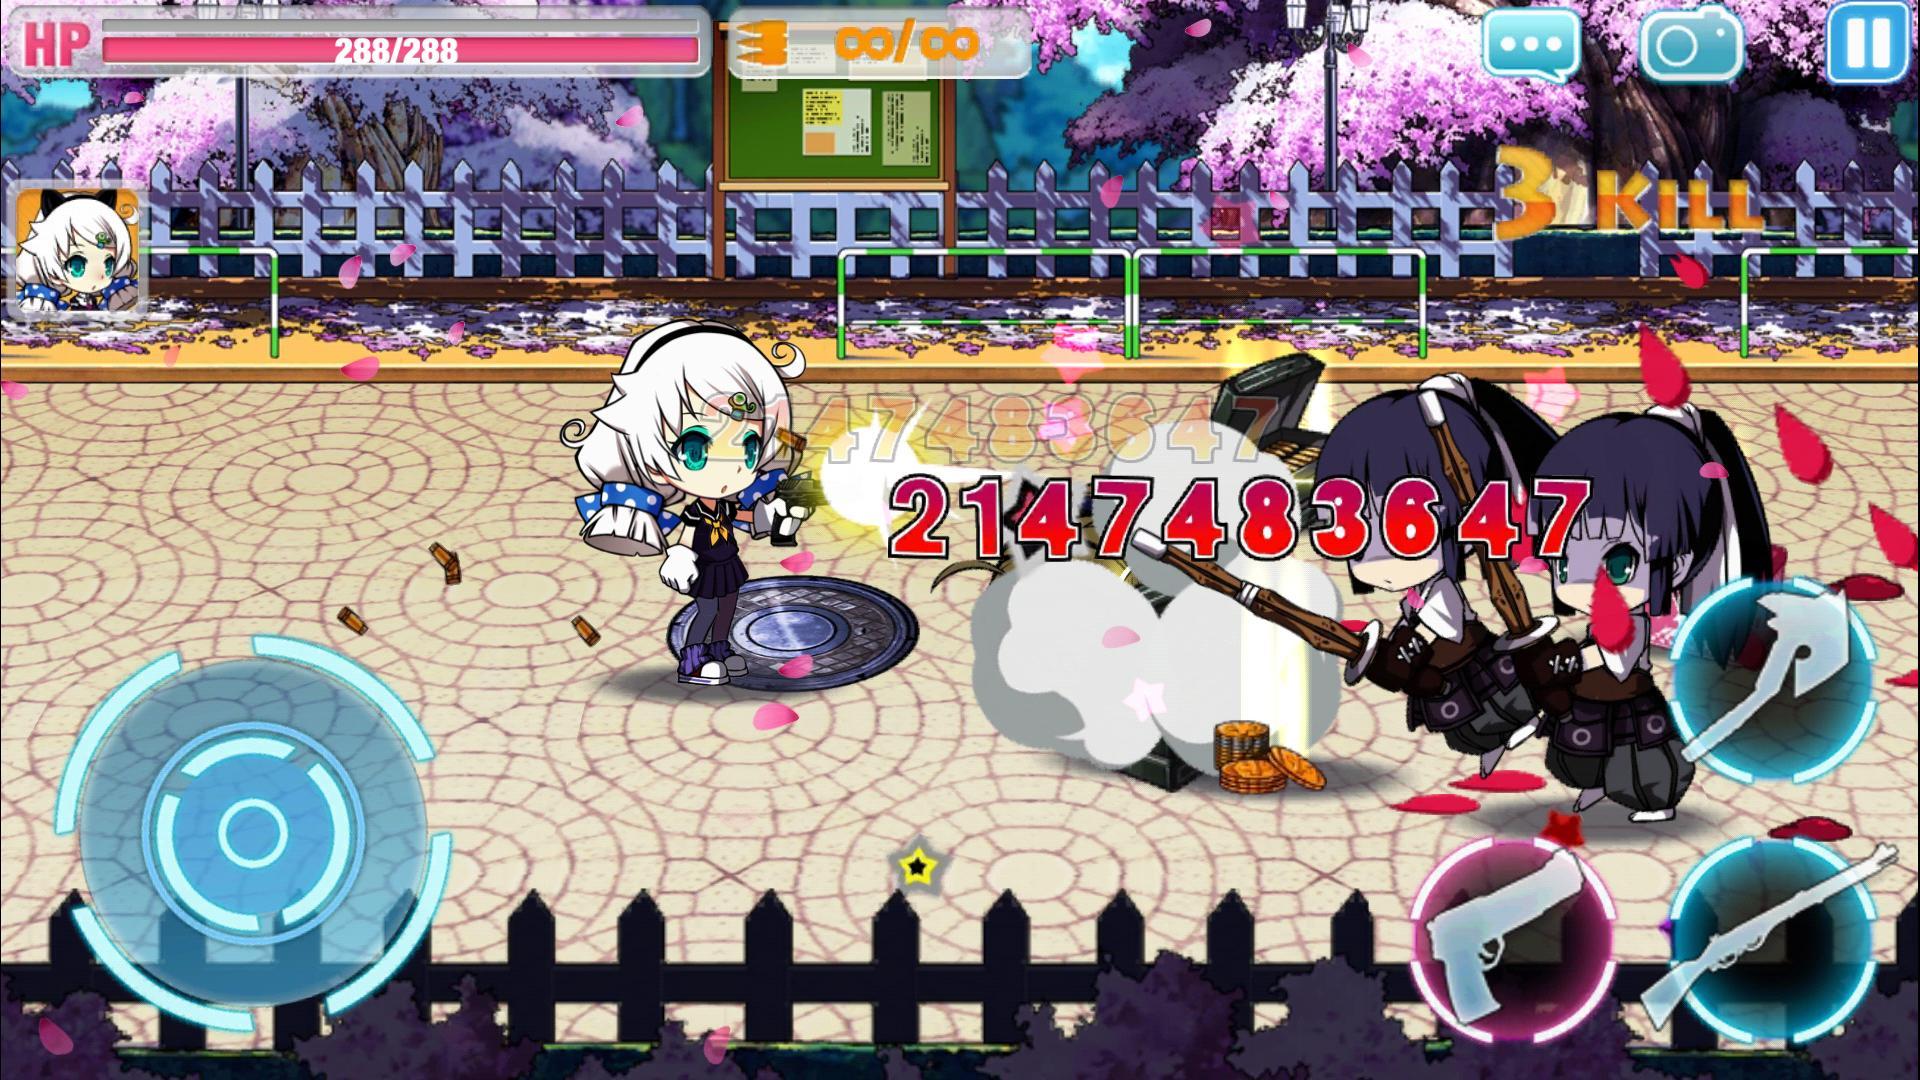 Guns-Girl-School-DayZ-v4.0.22-mod-apk